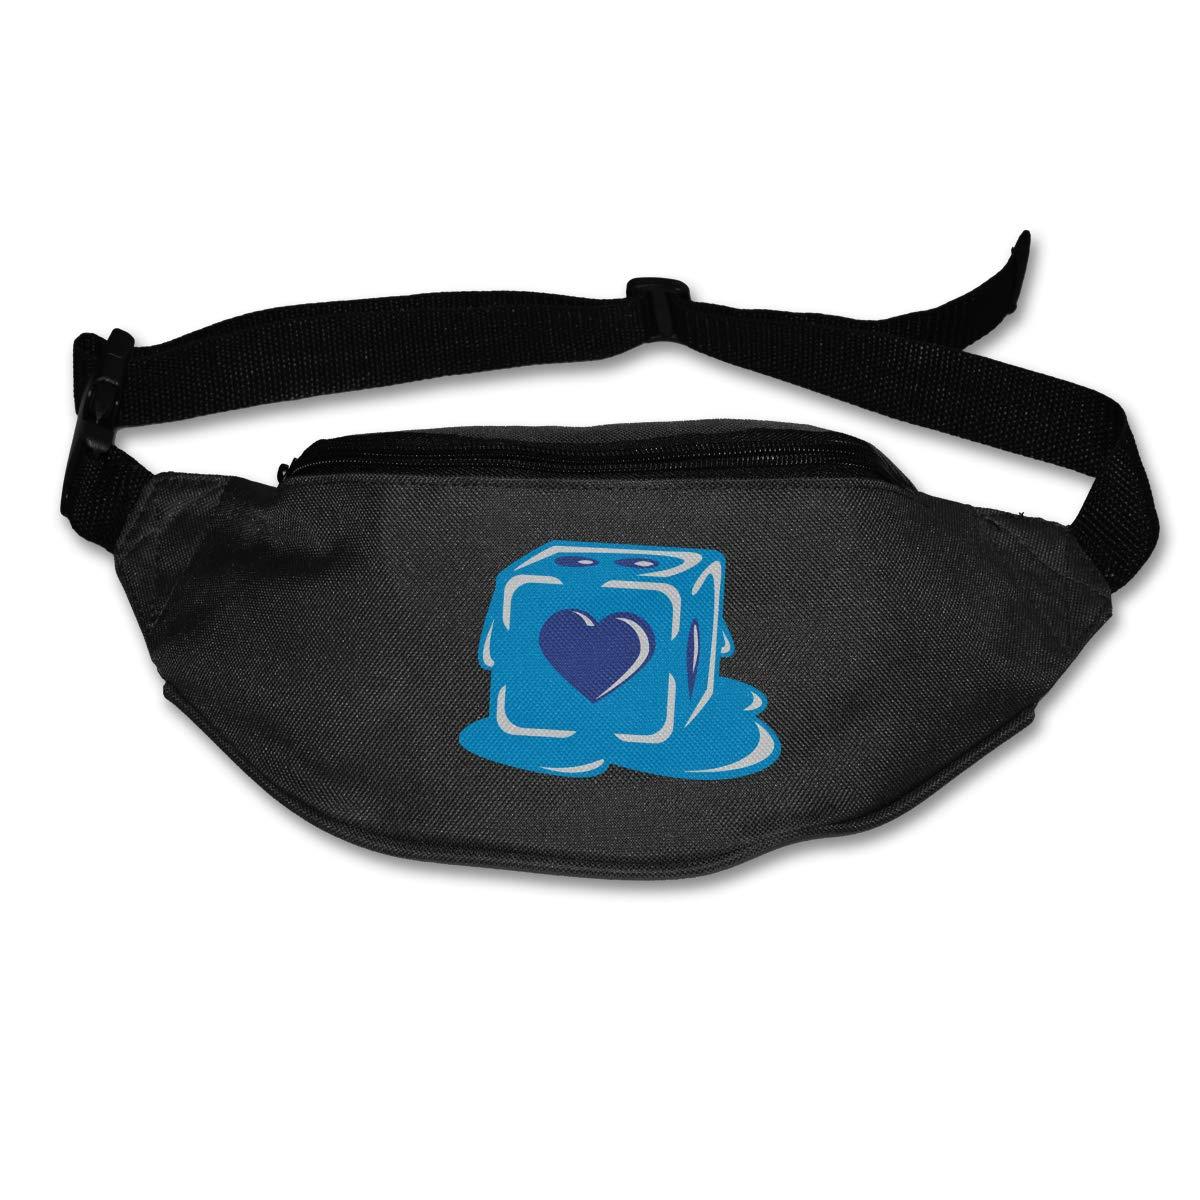 Blue Ice Cube Sport Waist Bag Fanny Pack Adjustable For Travel